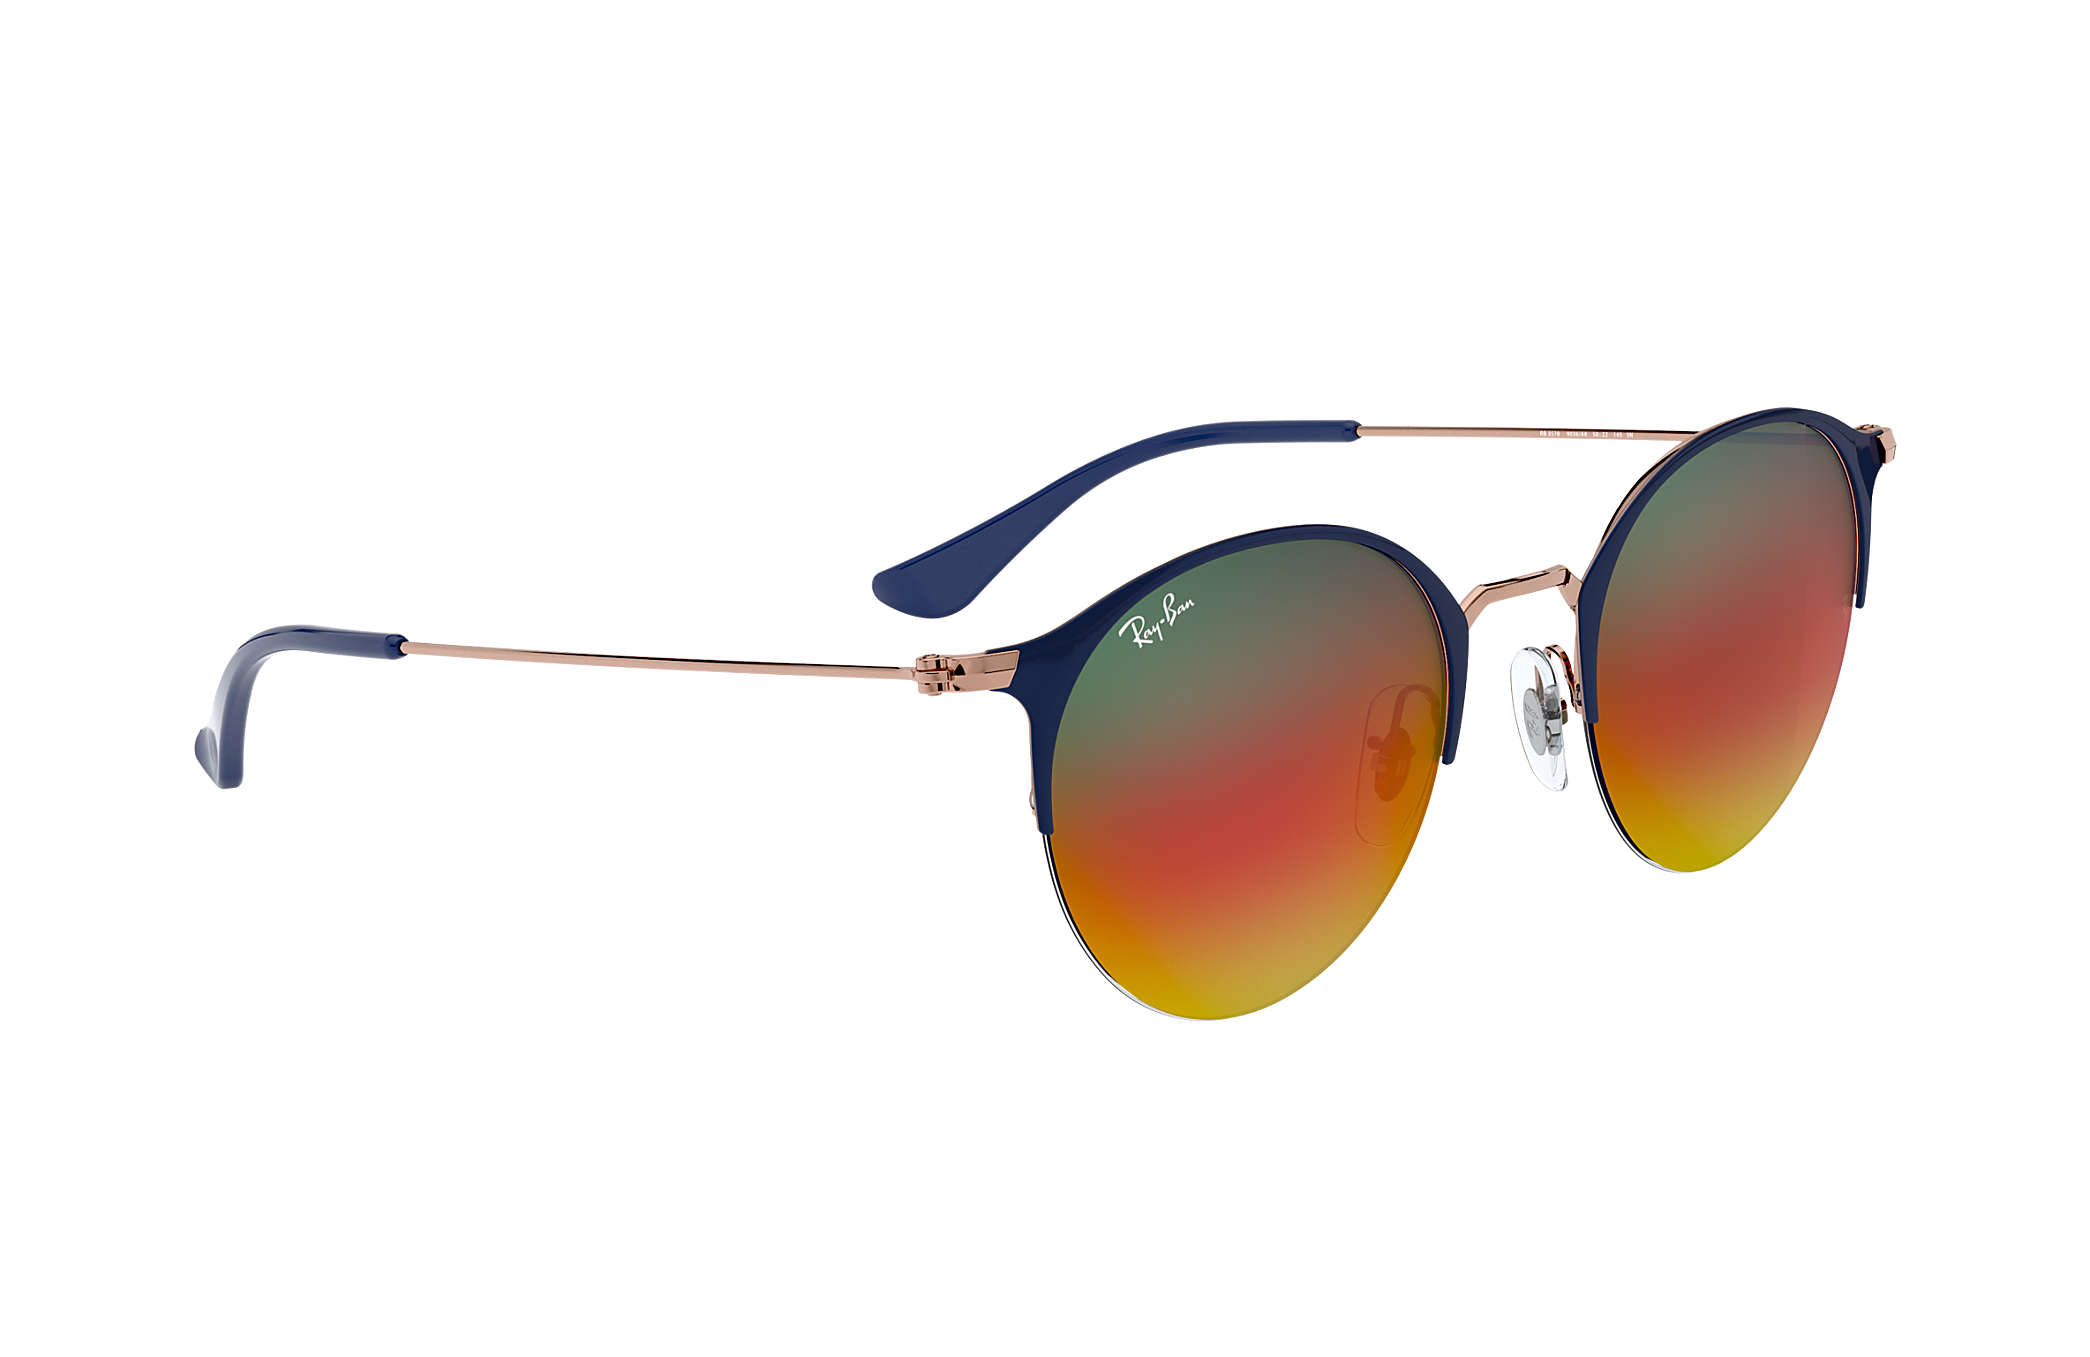 99beb387d5c Ray-Ban RB3578 Blue - Metal - Orange Lenses - 0RB35789036A850